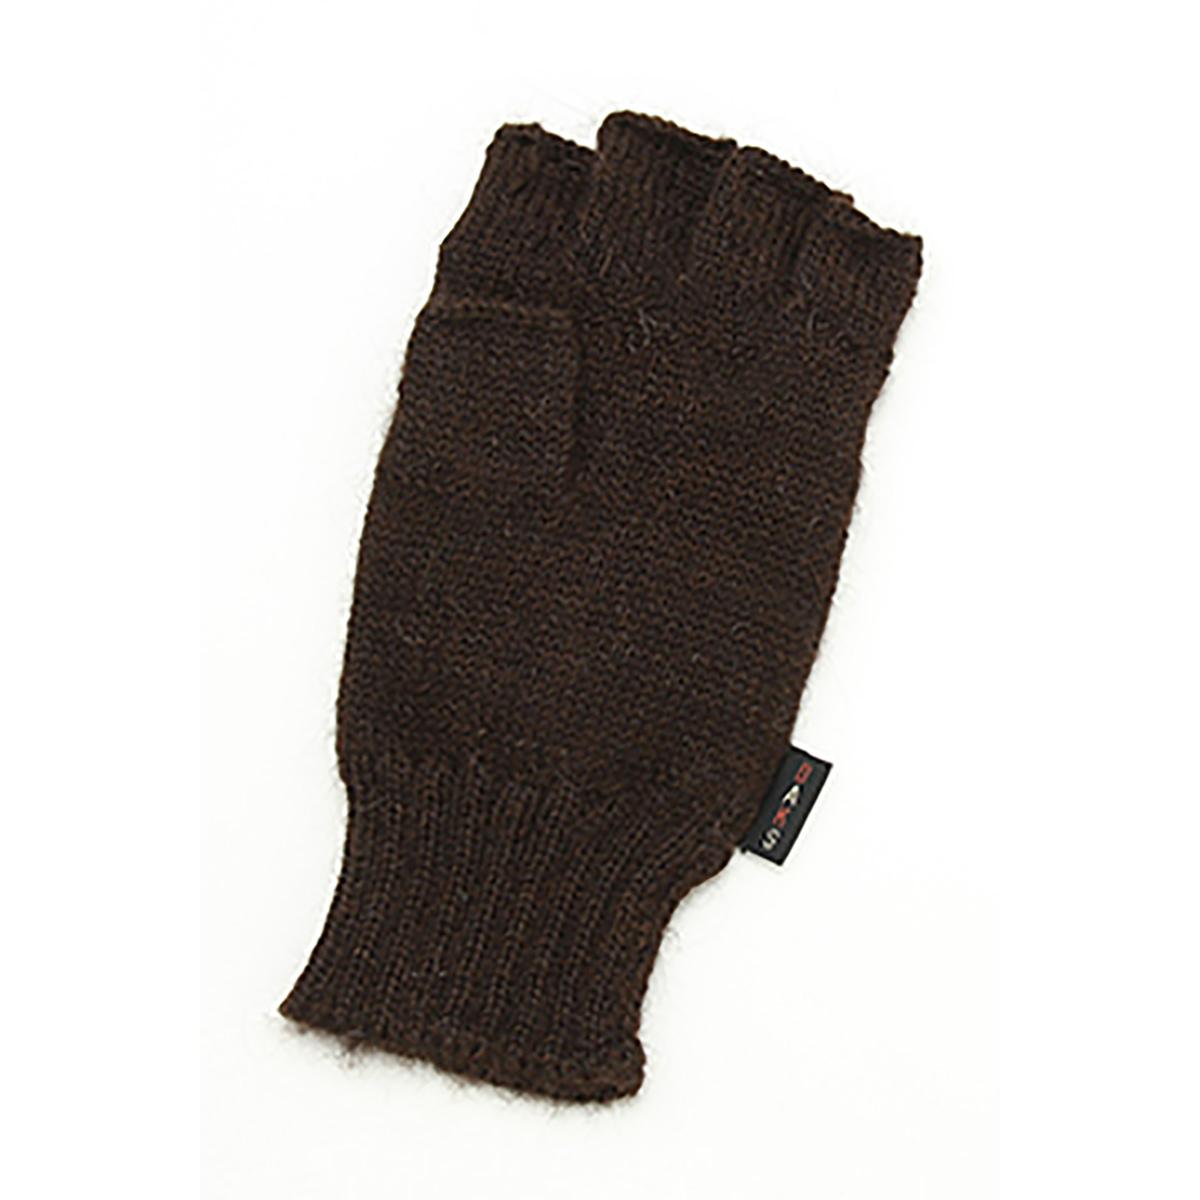 DAKS フード付き 2WAYミトン アルパカ100%ニット メンズ 手袋 フリーサイズ 全4色